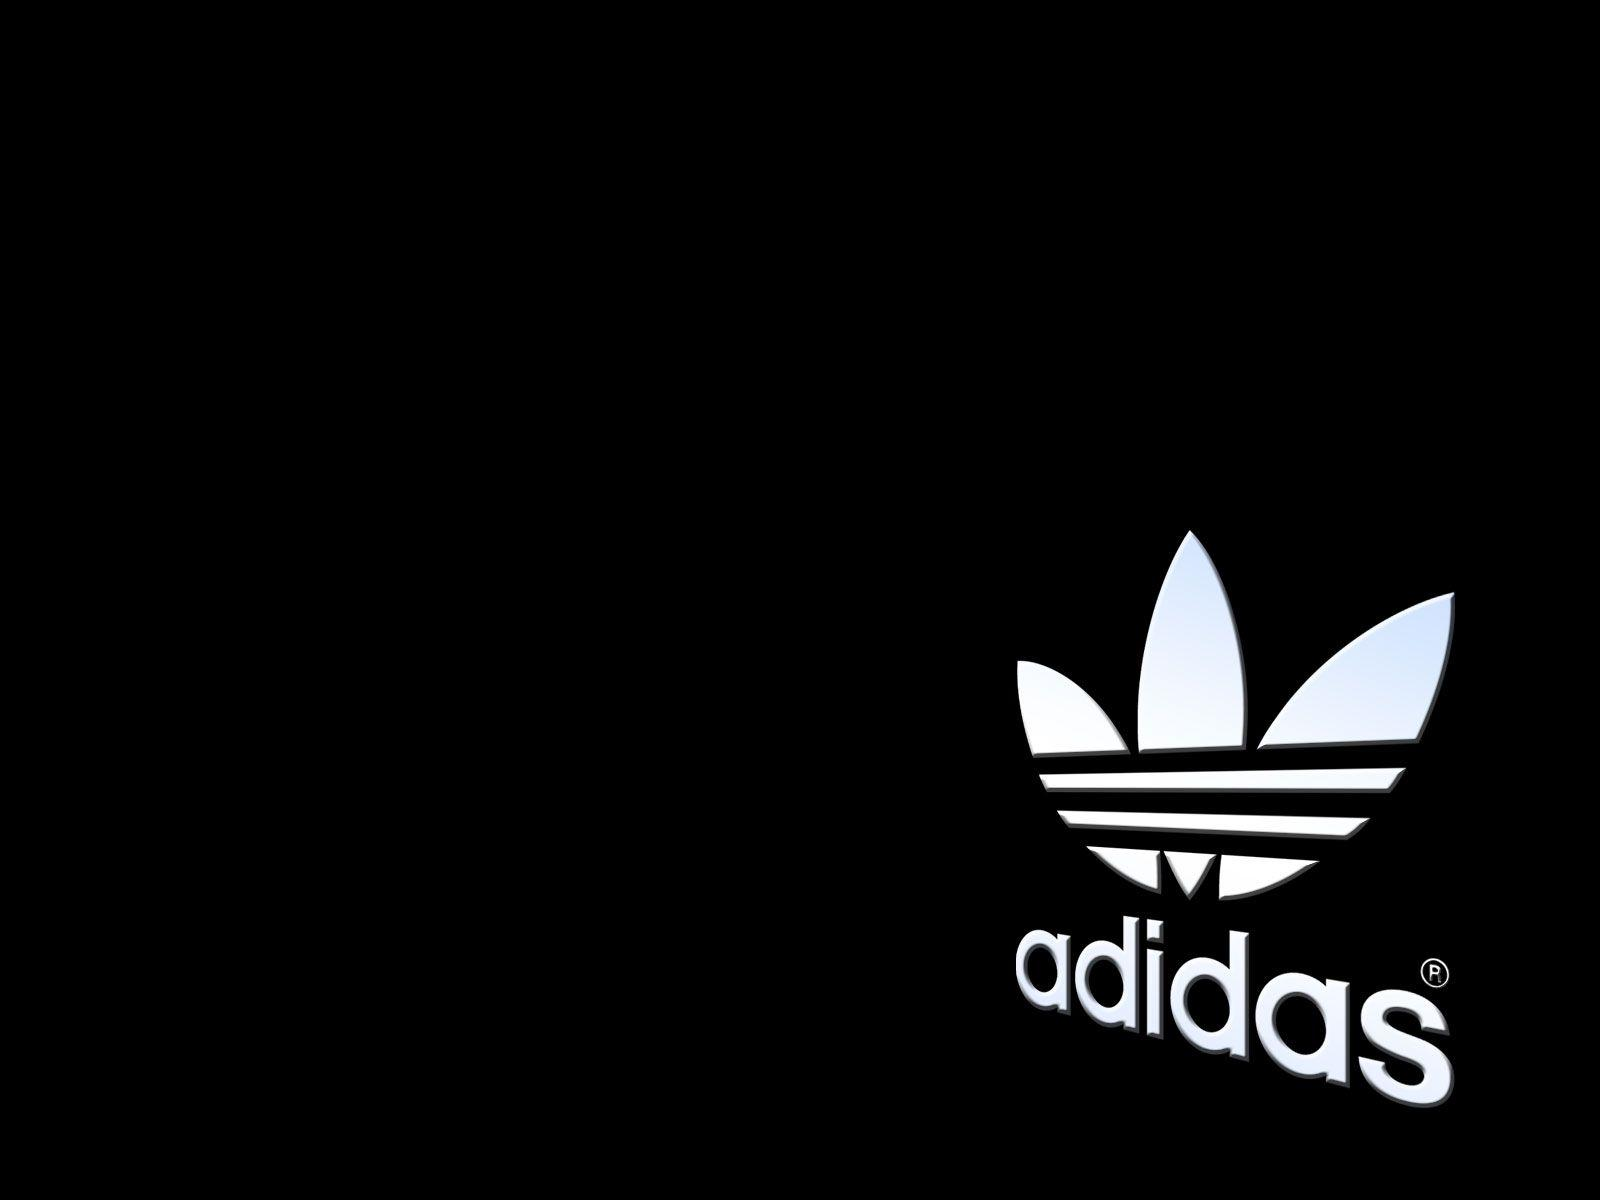 Adidas Black Wallpapers Wallpaper Cave